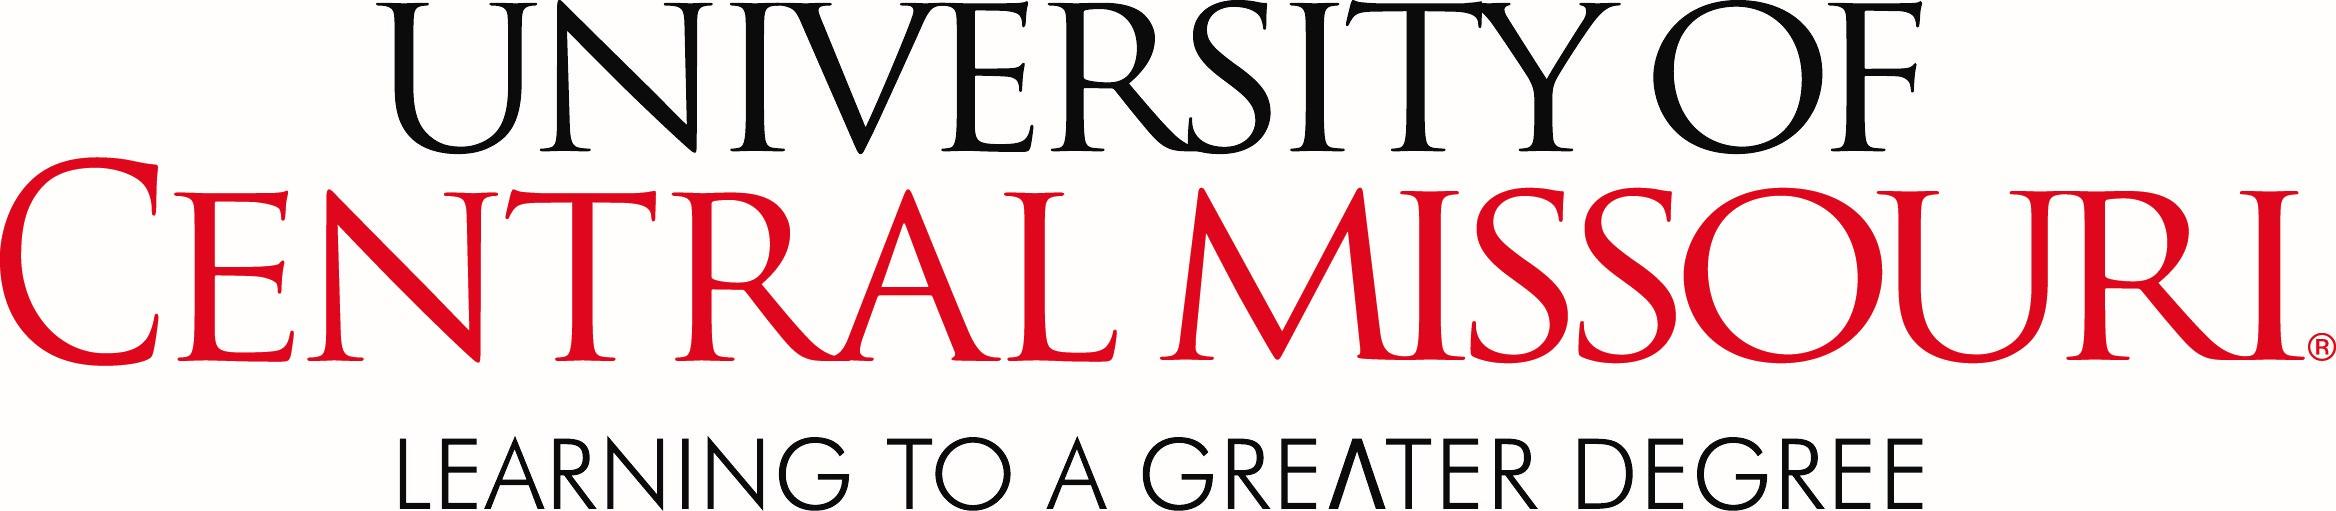 University of Central Missouri Career logo